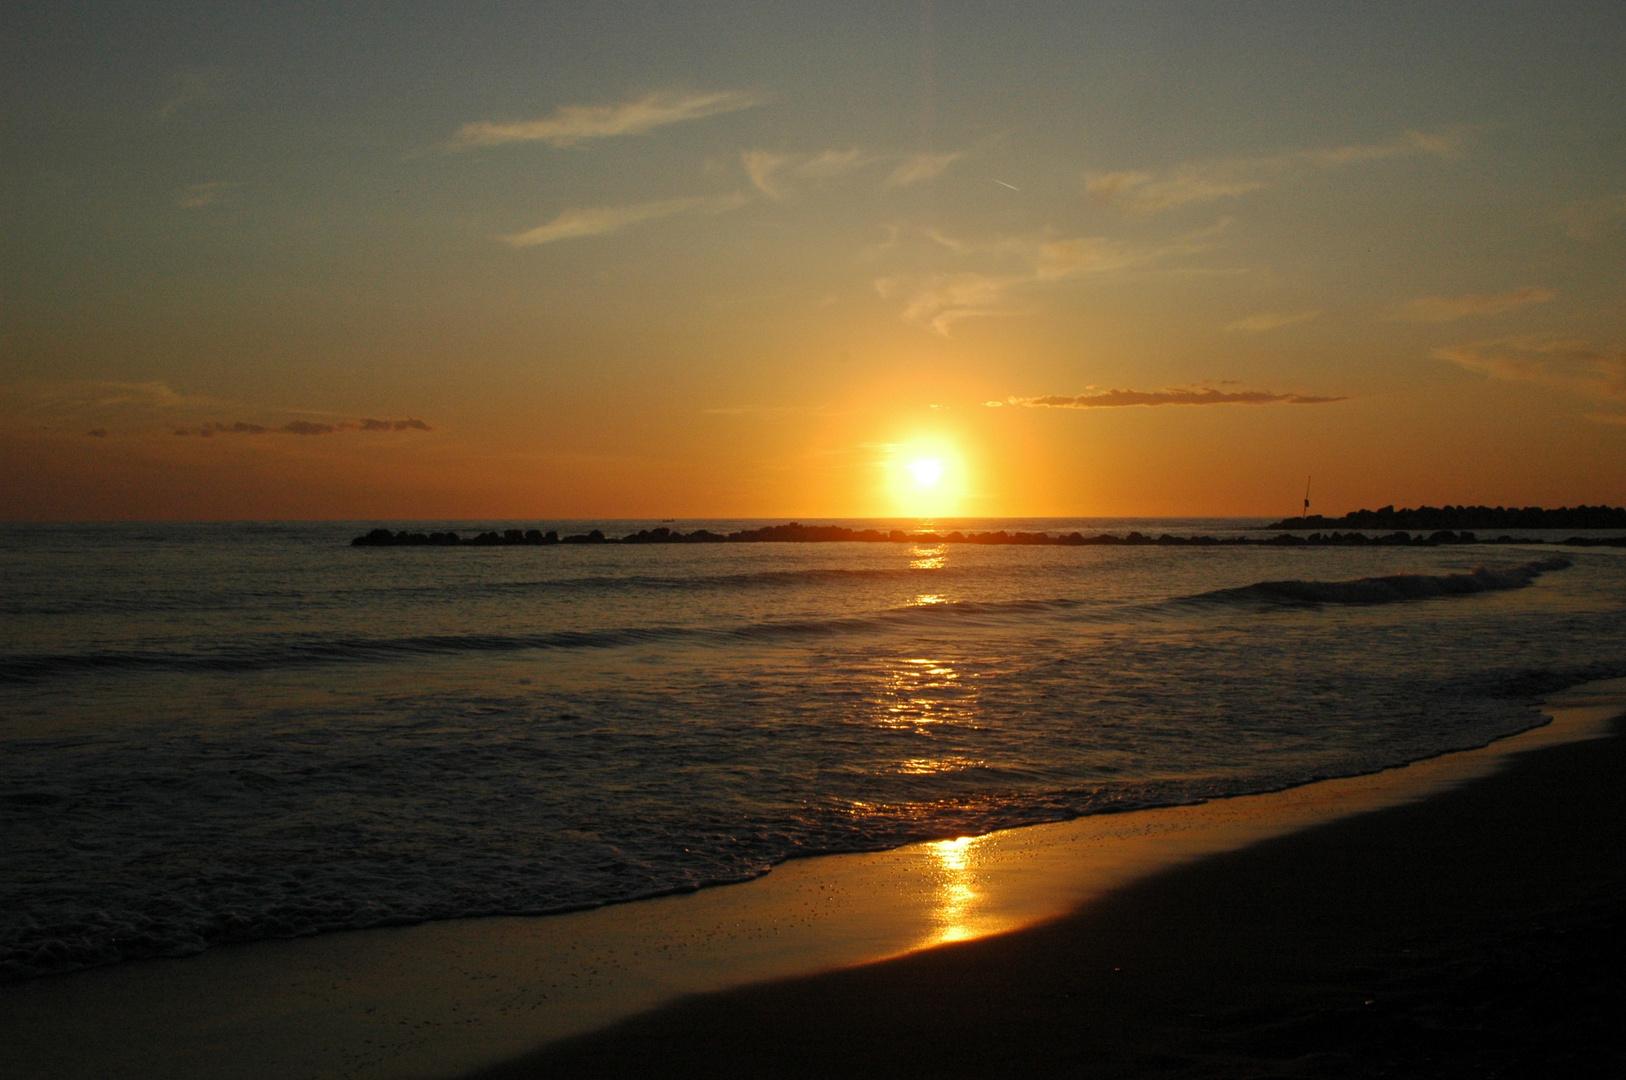 Italy Sonnenuntergang